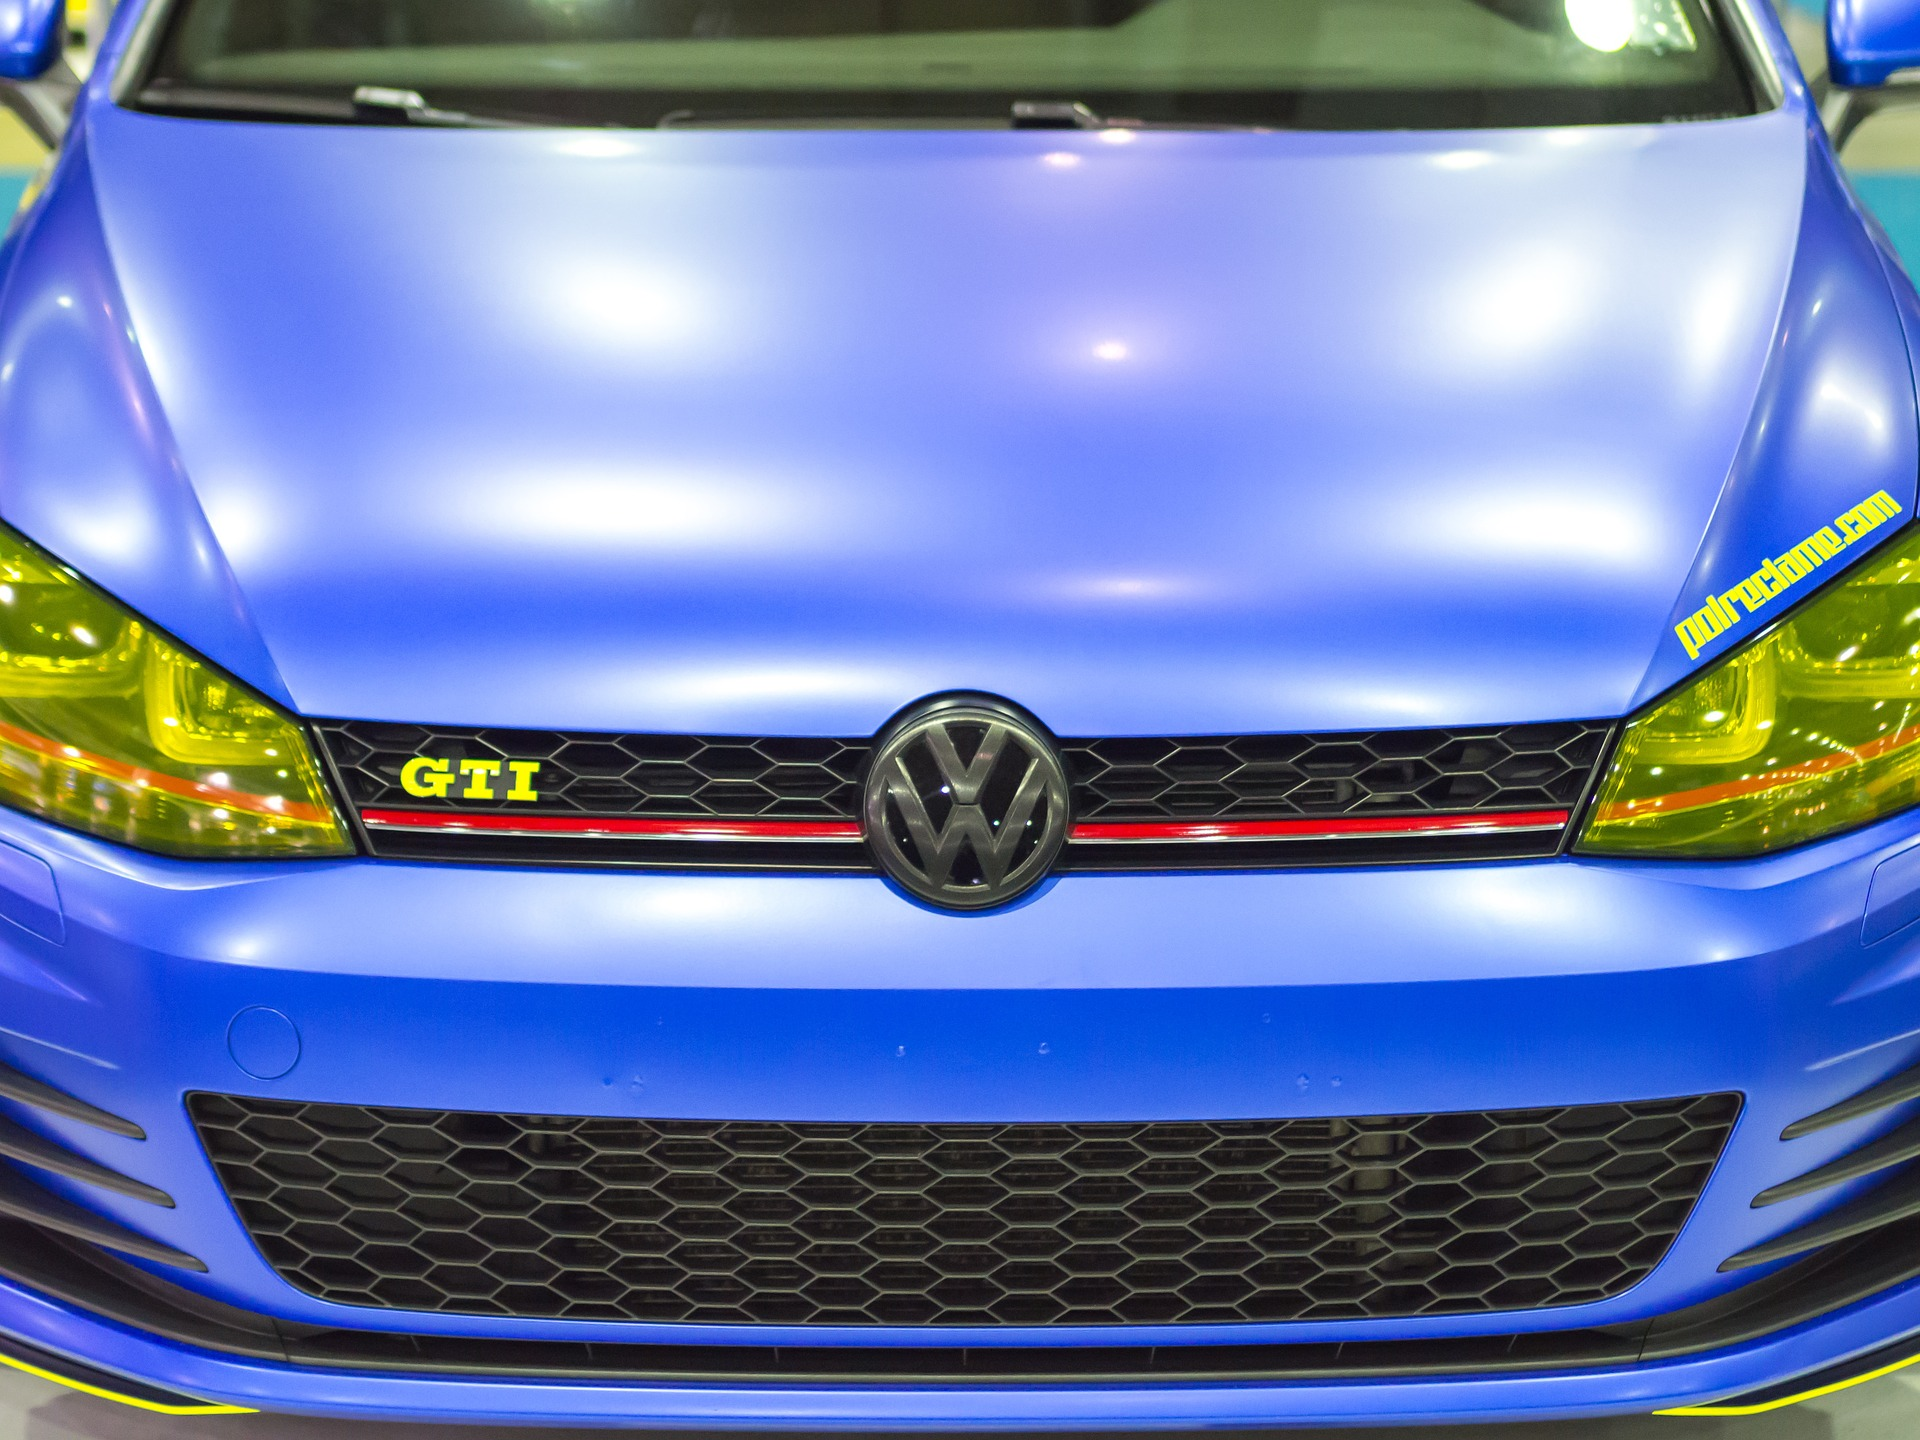 Blue Volkswagen, Auto, Automobile, Blue, Car, HQ Photo